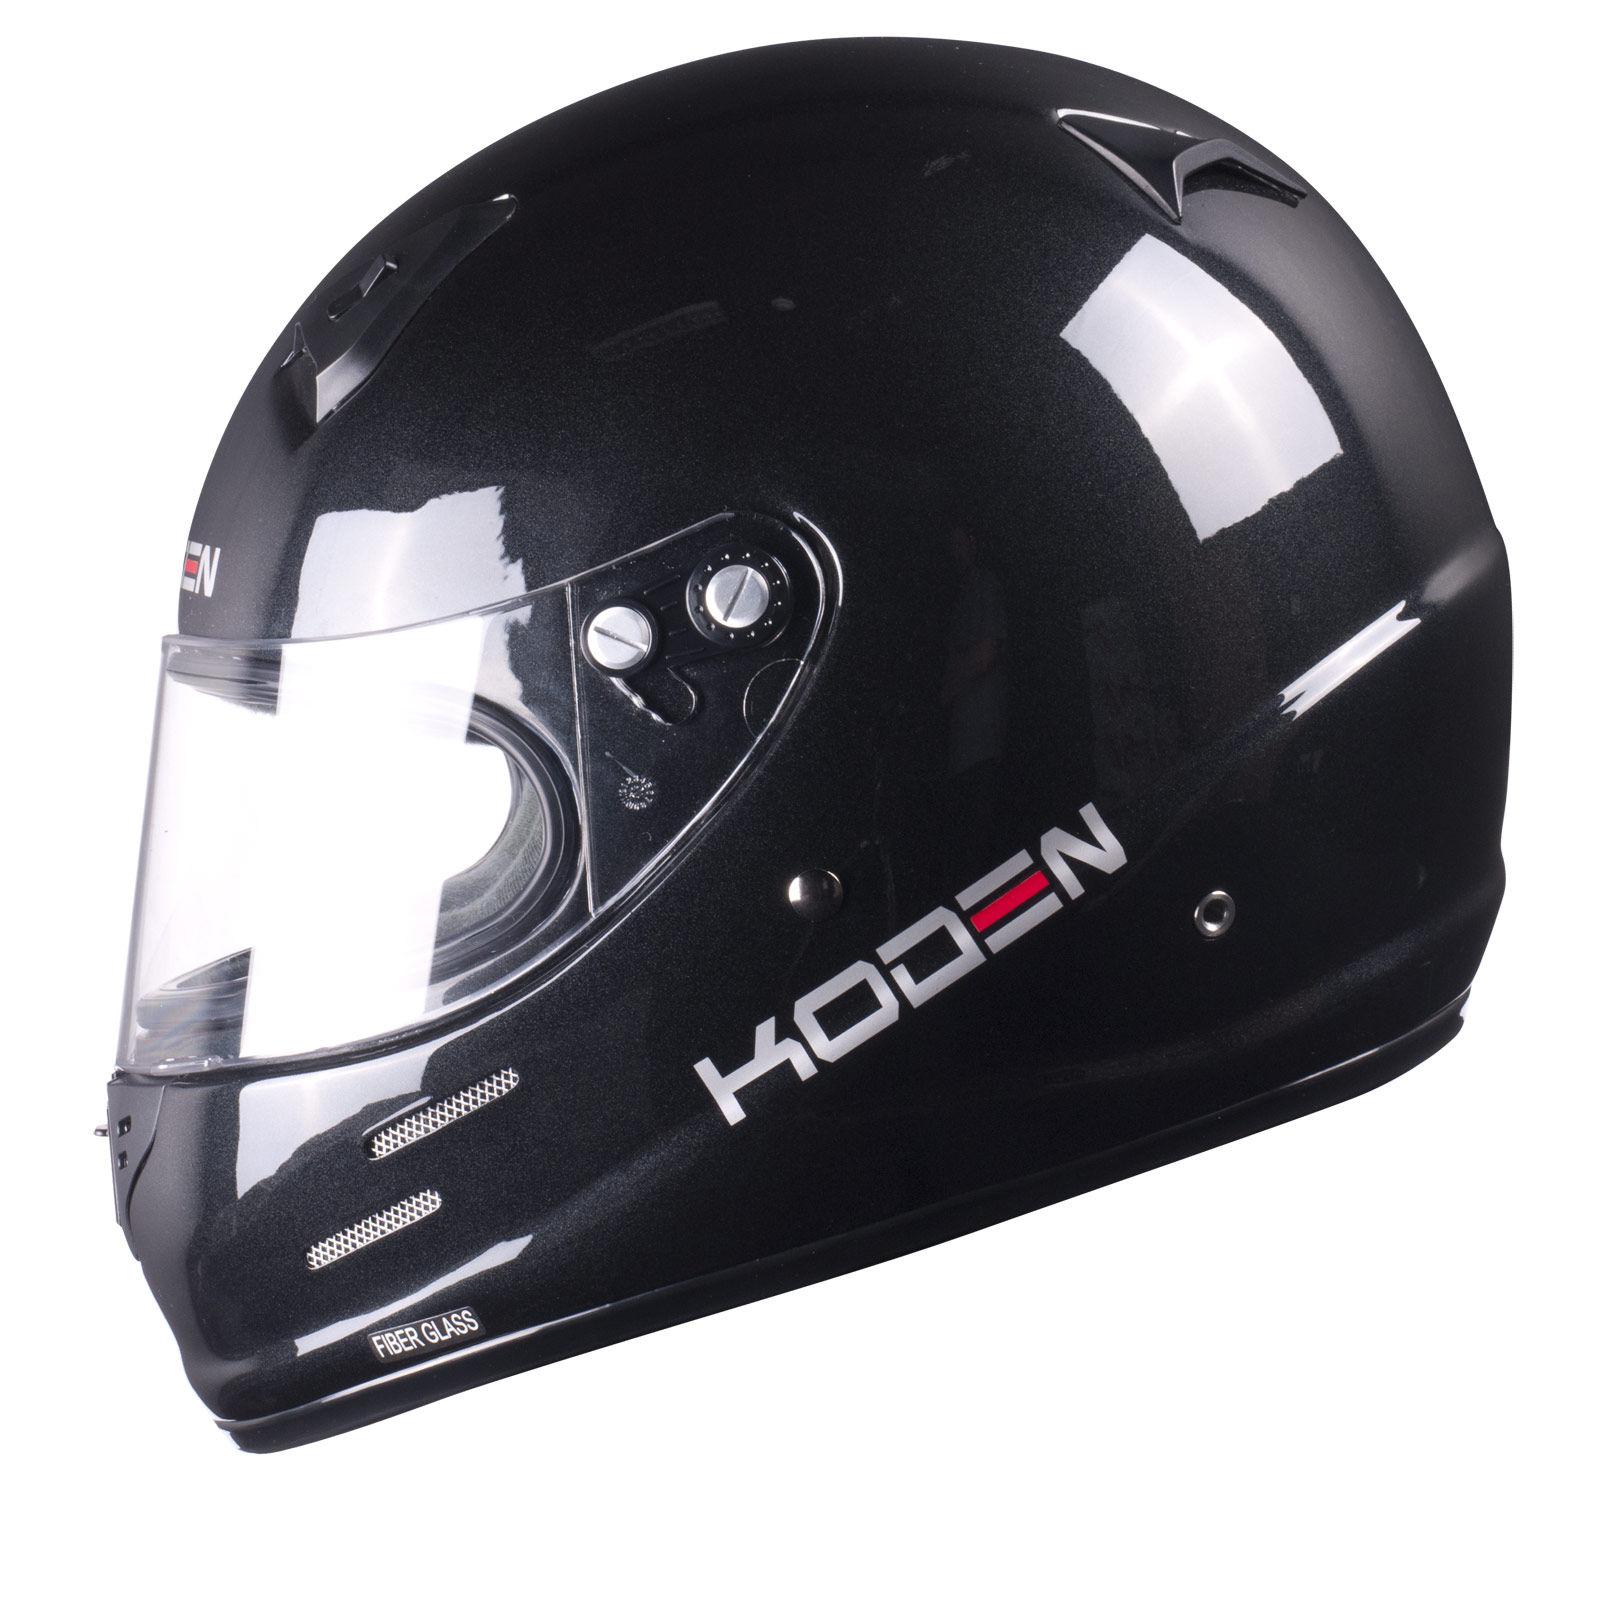 Sparco Club X1 Helmet >> Koden Childrens Kids Kart Karting CMR Race Track Helmet Carbon or Fibreglass | eBay